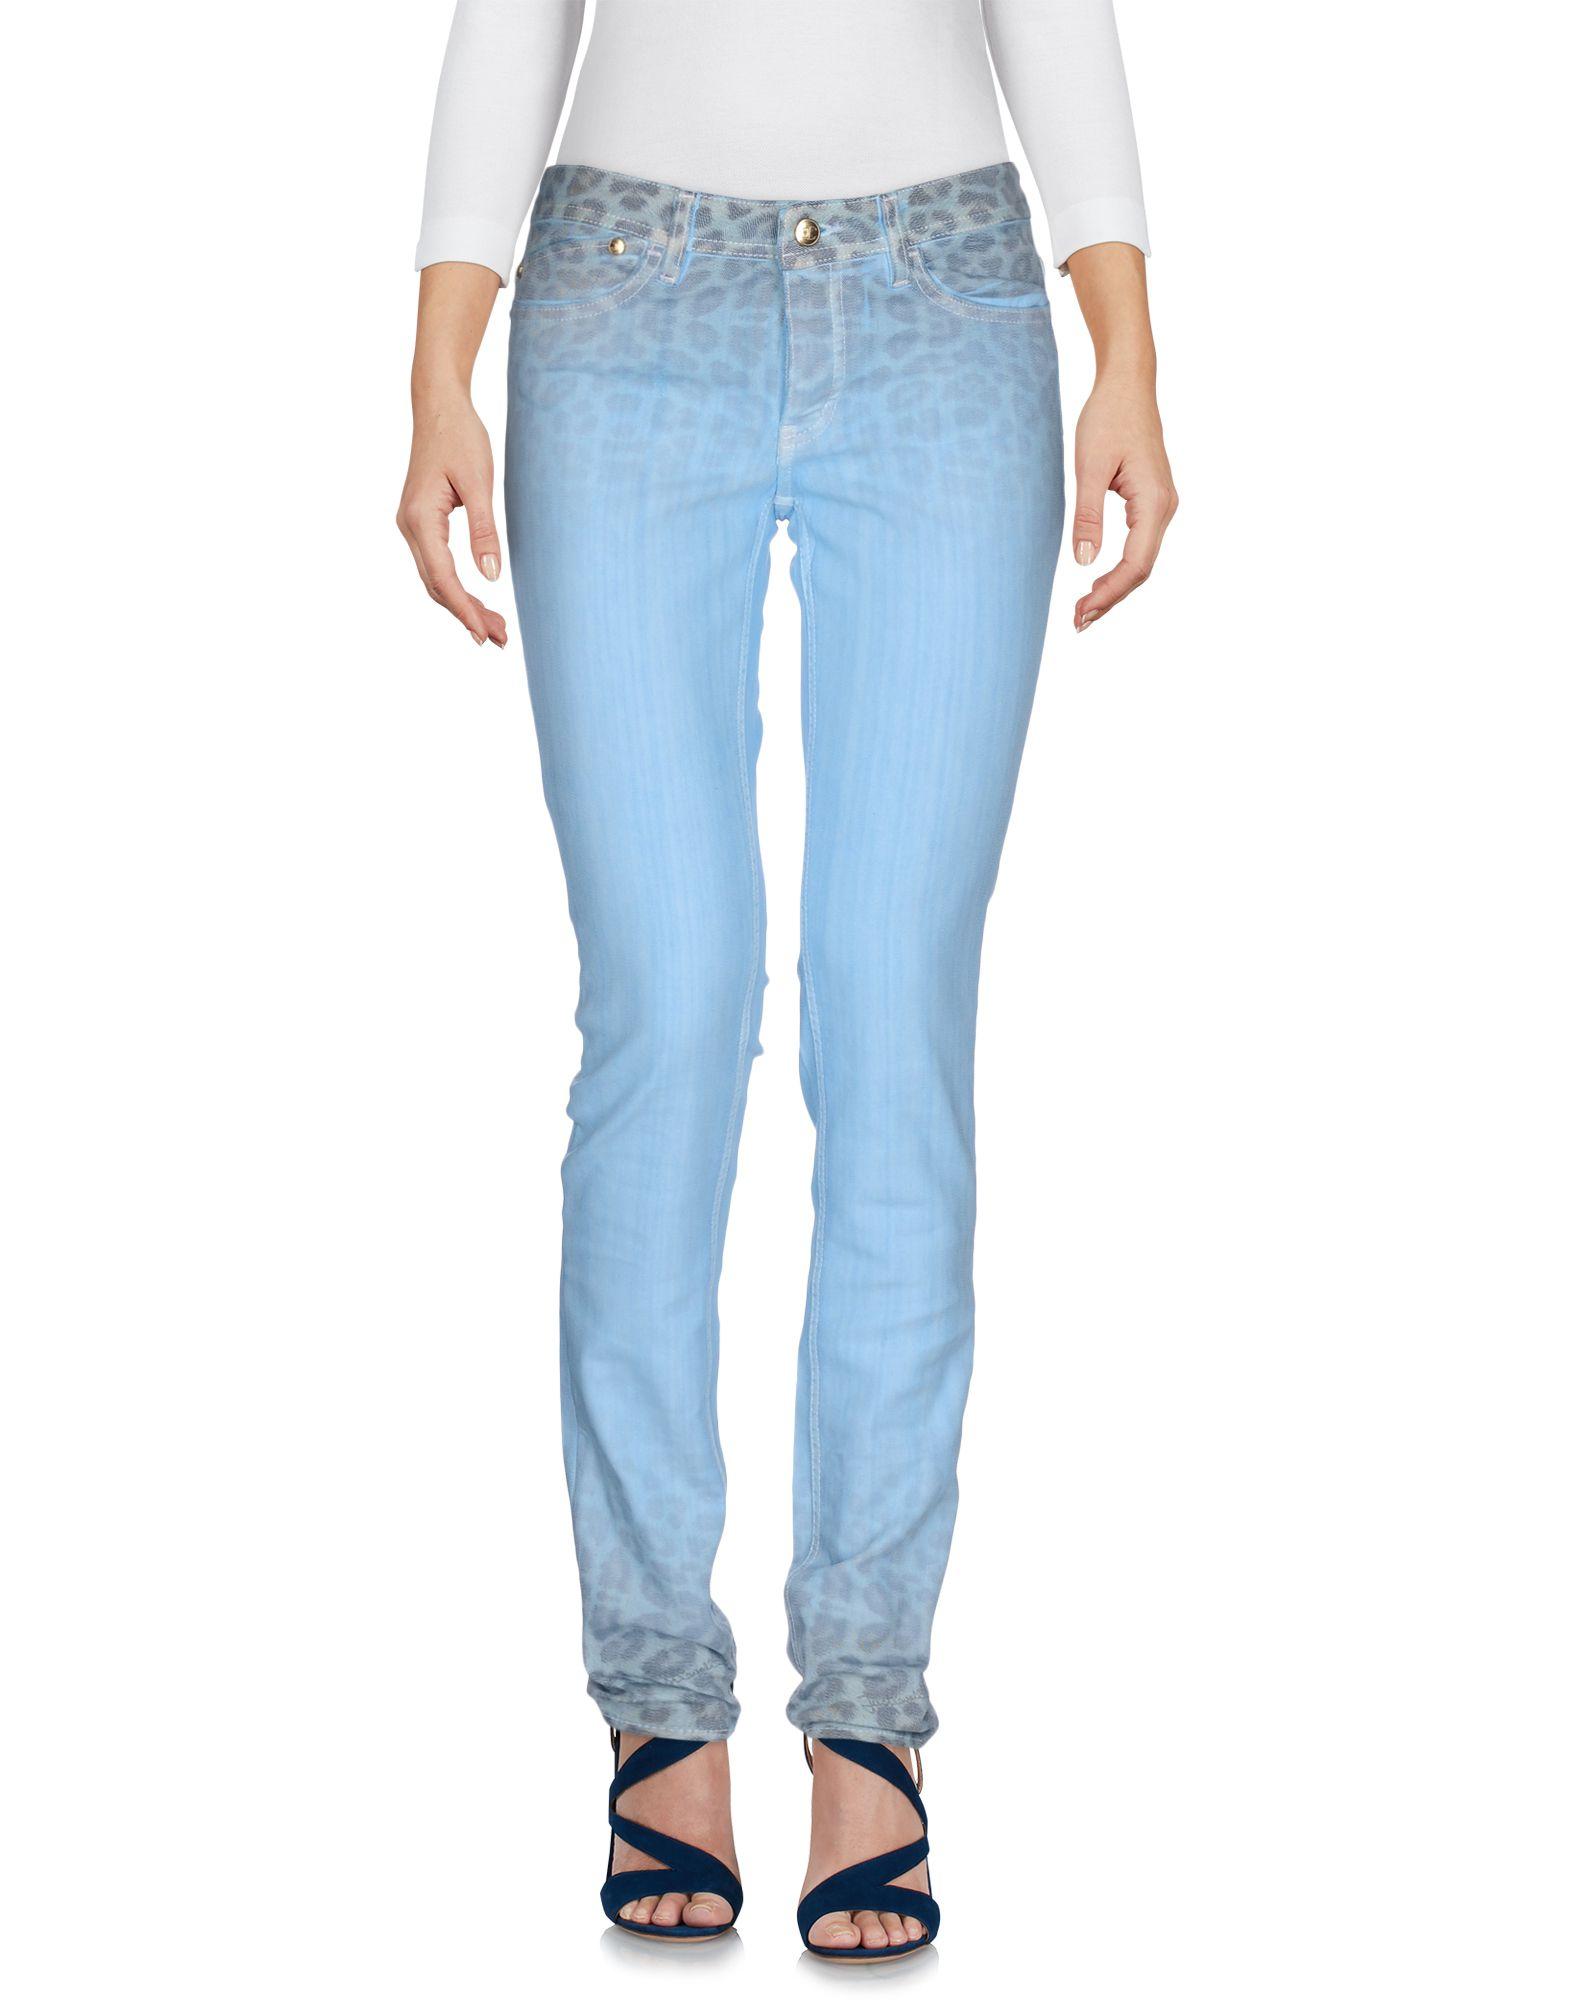 Pantaloni Jeans Just Cavalli damen - 42615756EM